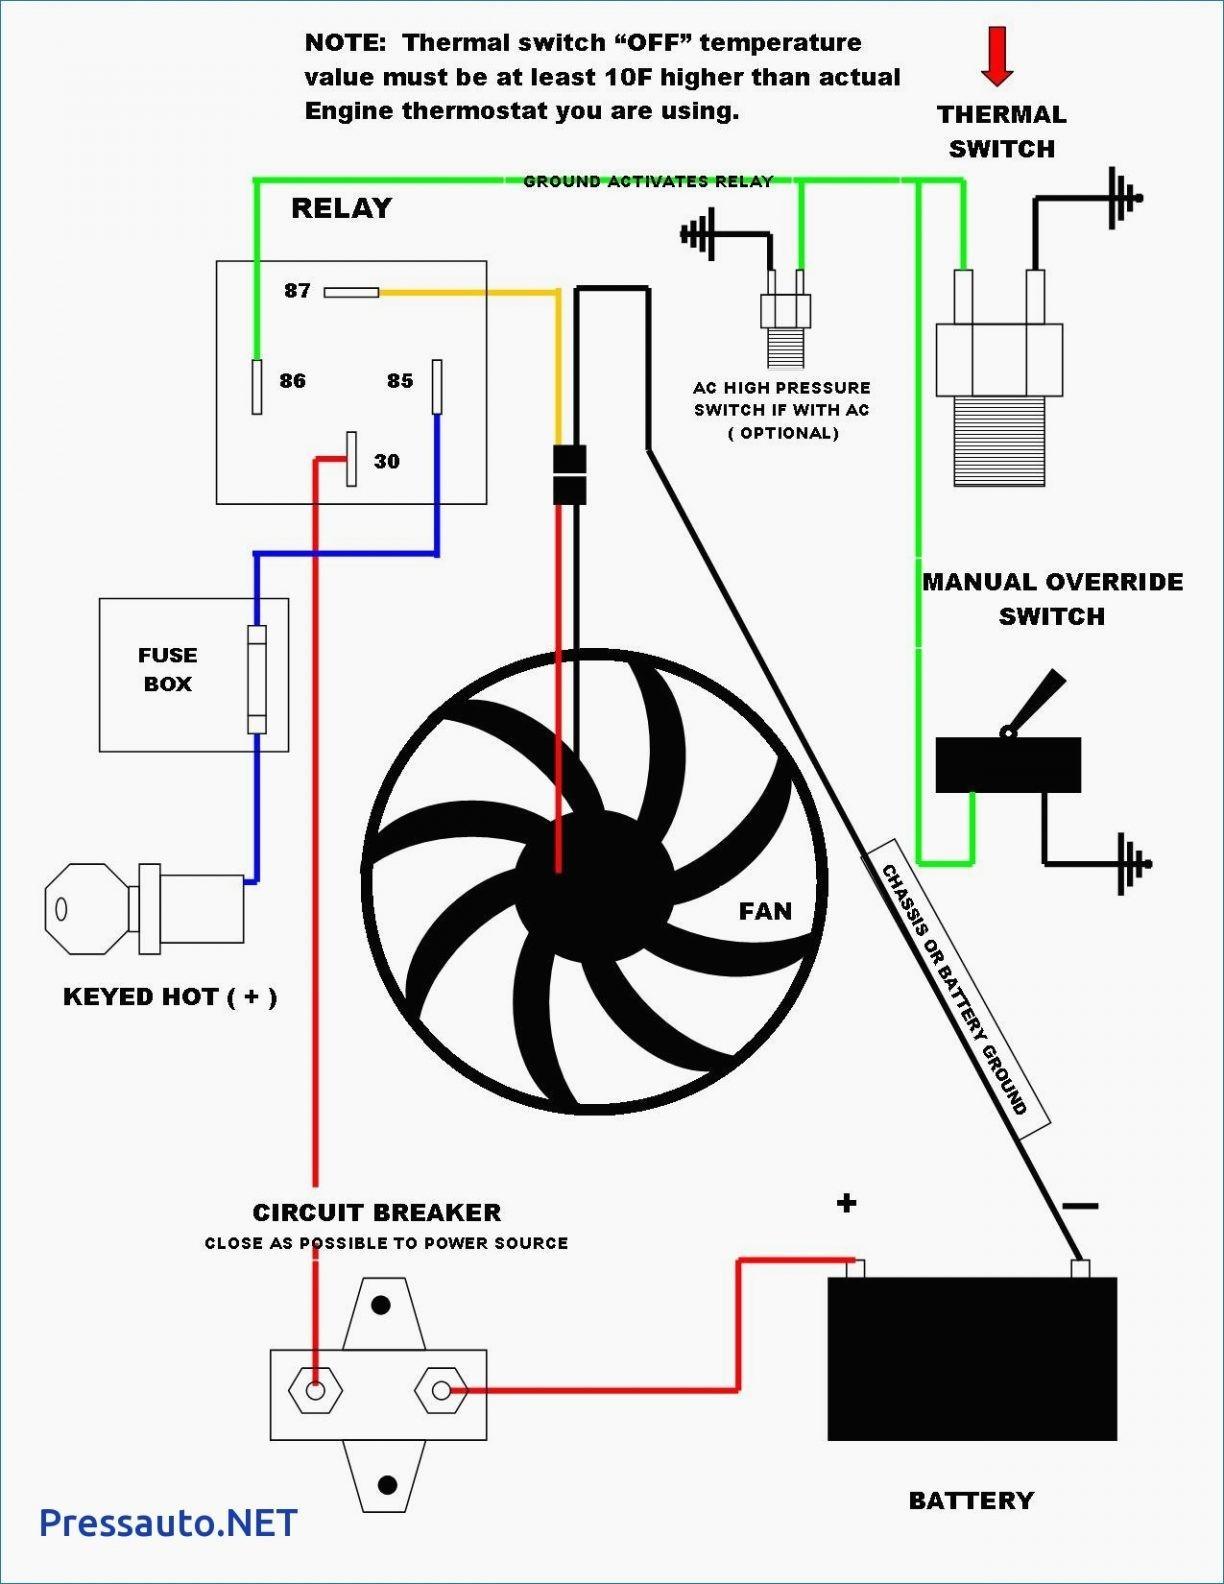 Breakaway Switch Wiring Diagram Trailer Breakaway Kit Wiring Diagram Free Downloads Trailer Of Breakaway Switch Wiring Diagram